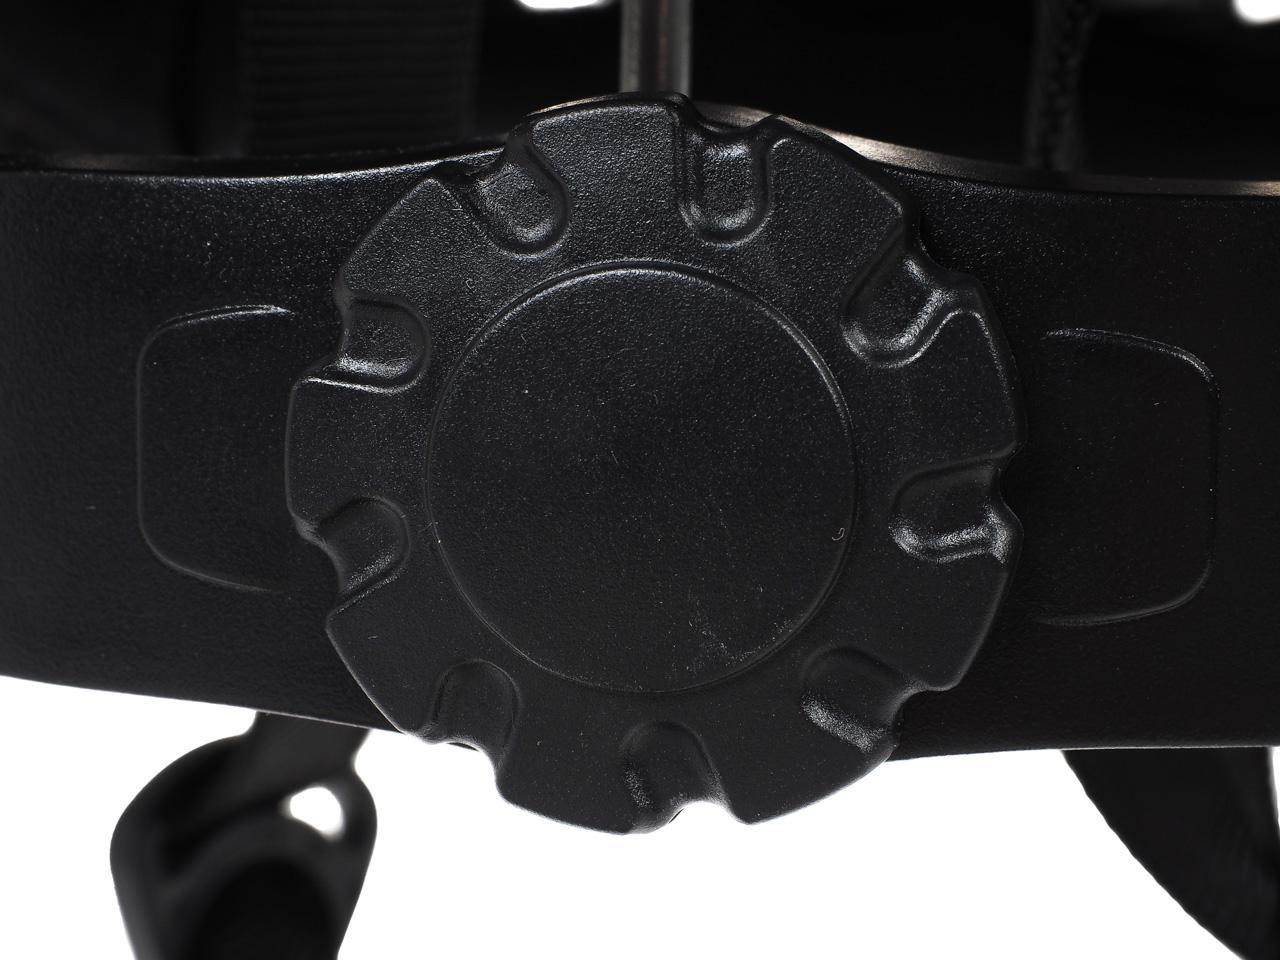 Casque-roller-skate-trotinette-Rollerblade-Twist-jr-blc-casque-Rose-15103-Neuf miniature 3